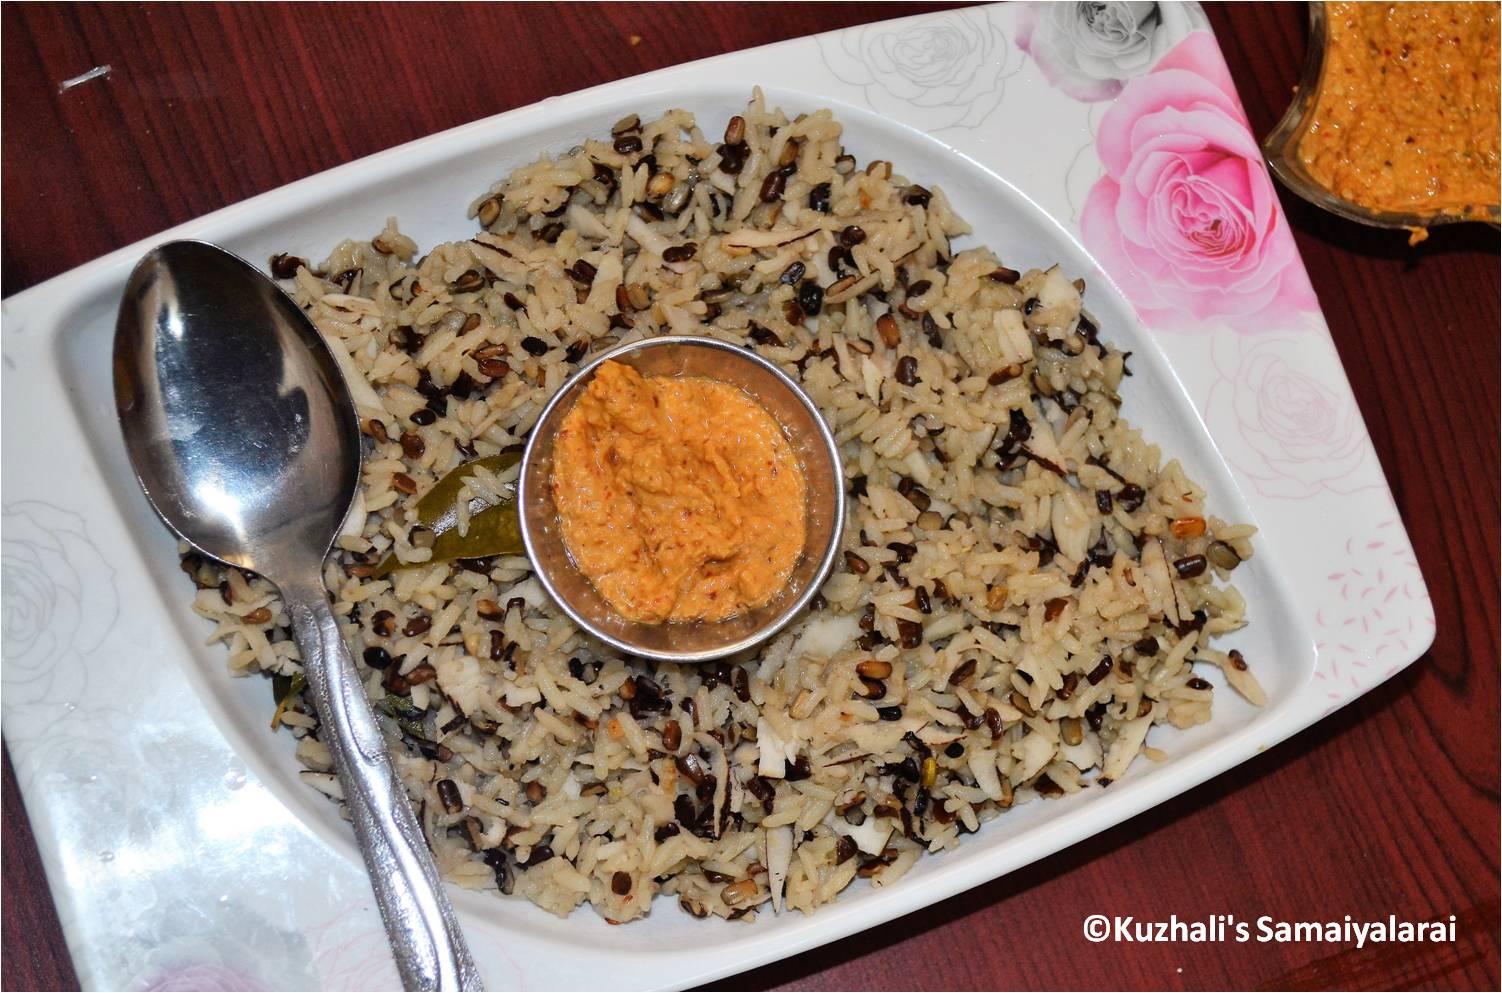 http://www.kuzhalisamaiyalarai.in/2017/02/ulunthu-paruppu-satham-urad-dhal-rice.html